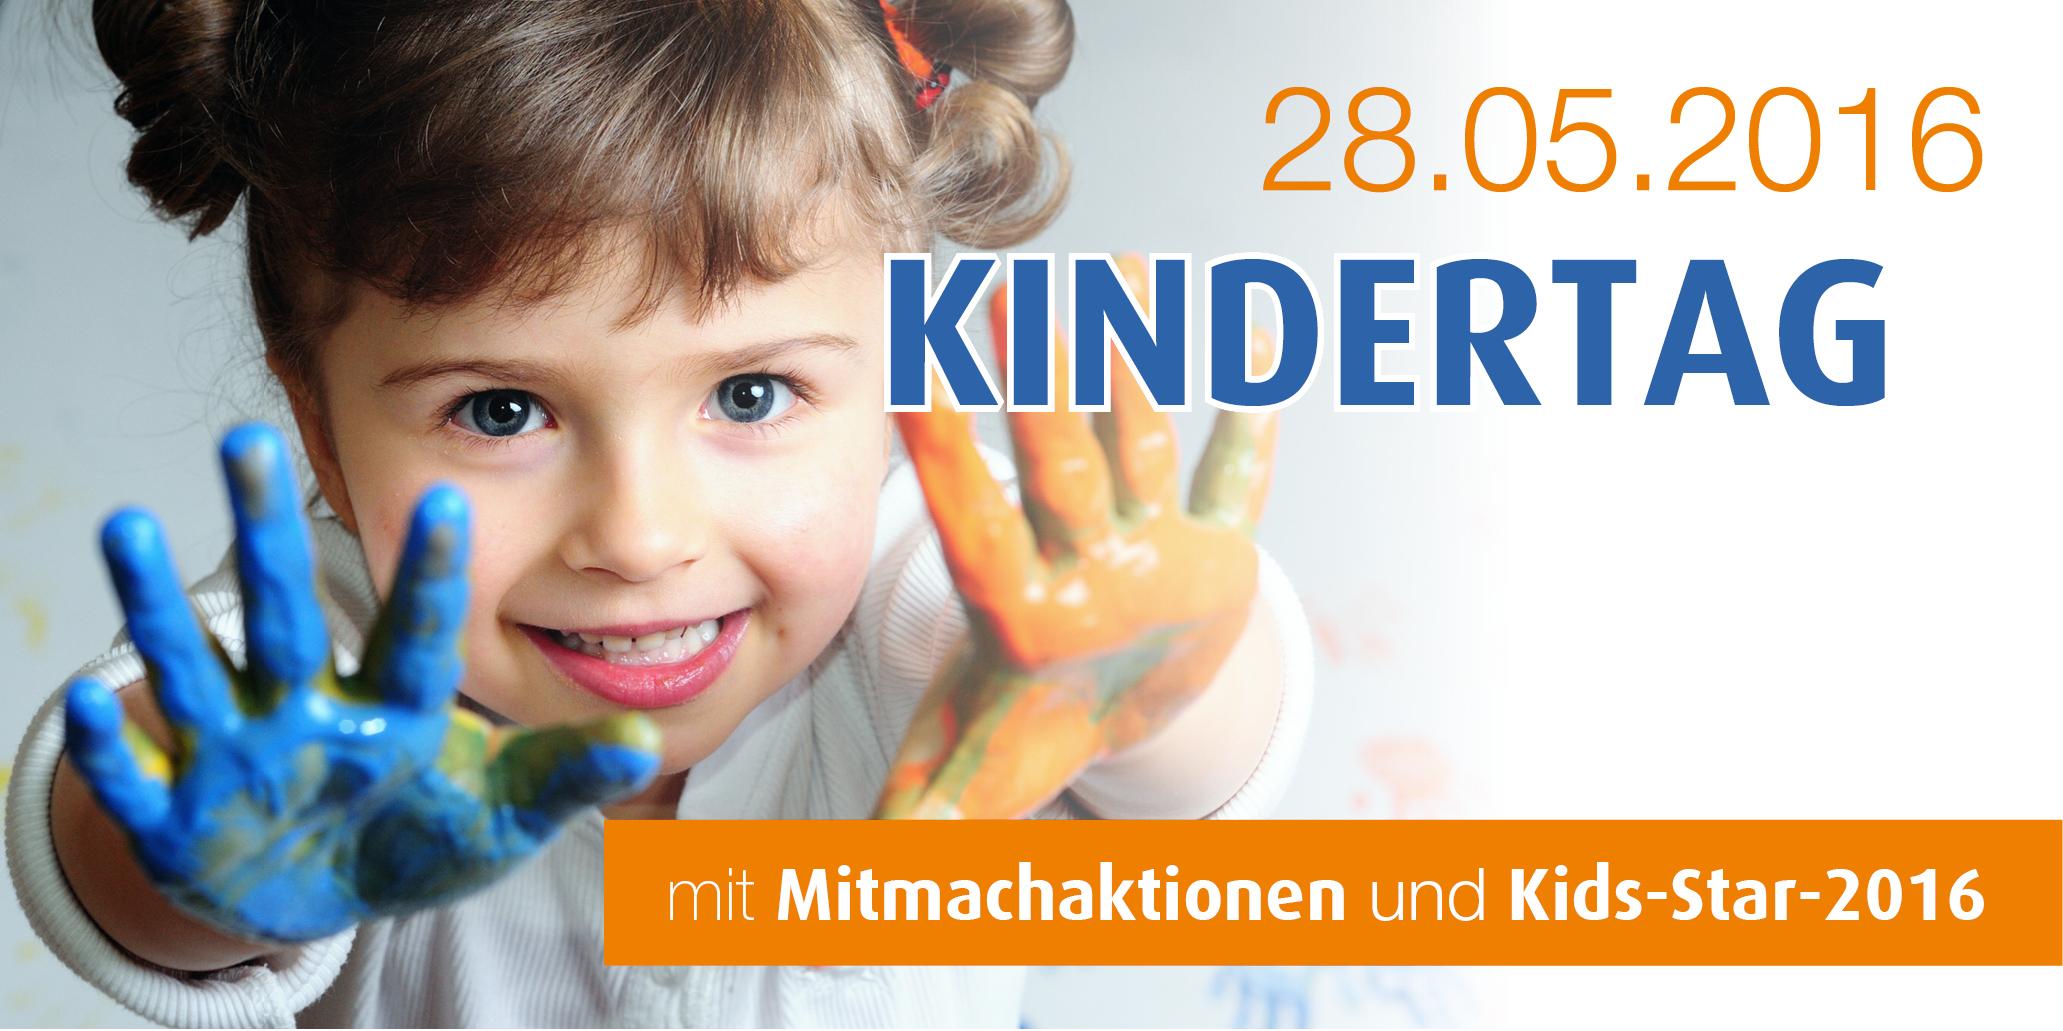 Der HavelPark feiert Kindertag